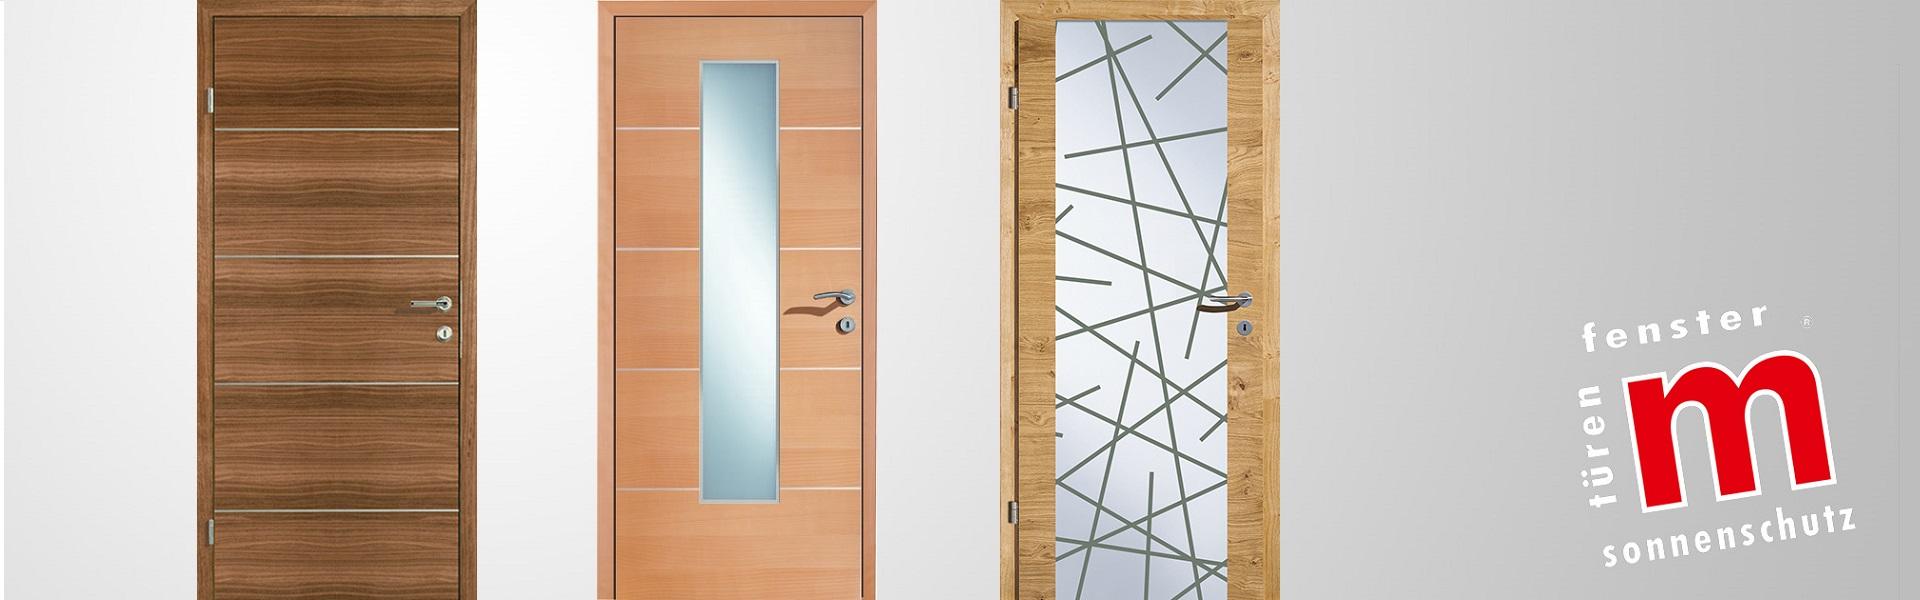 Muralter Fenster - Türen  - Sonnenschutz